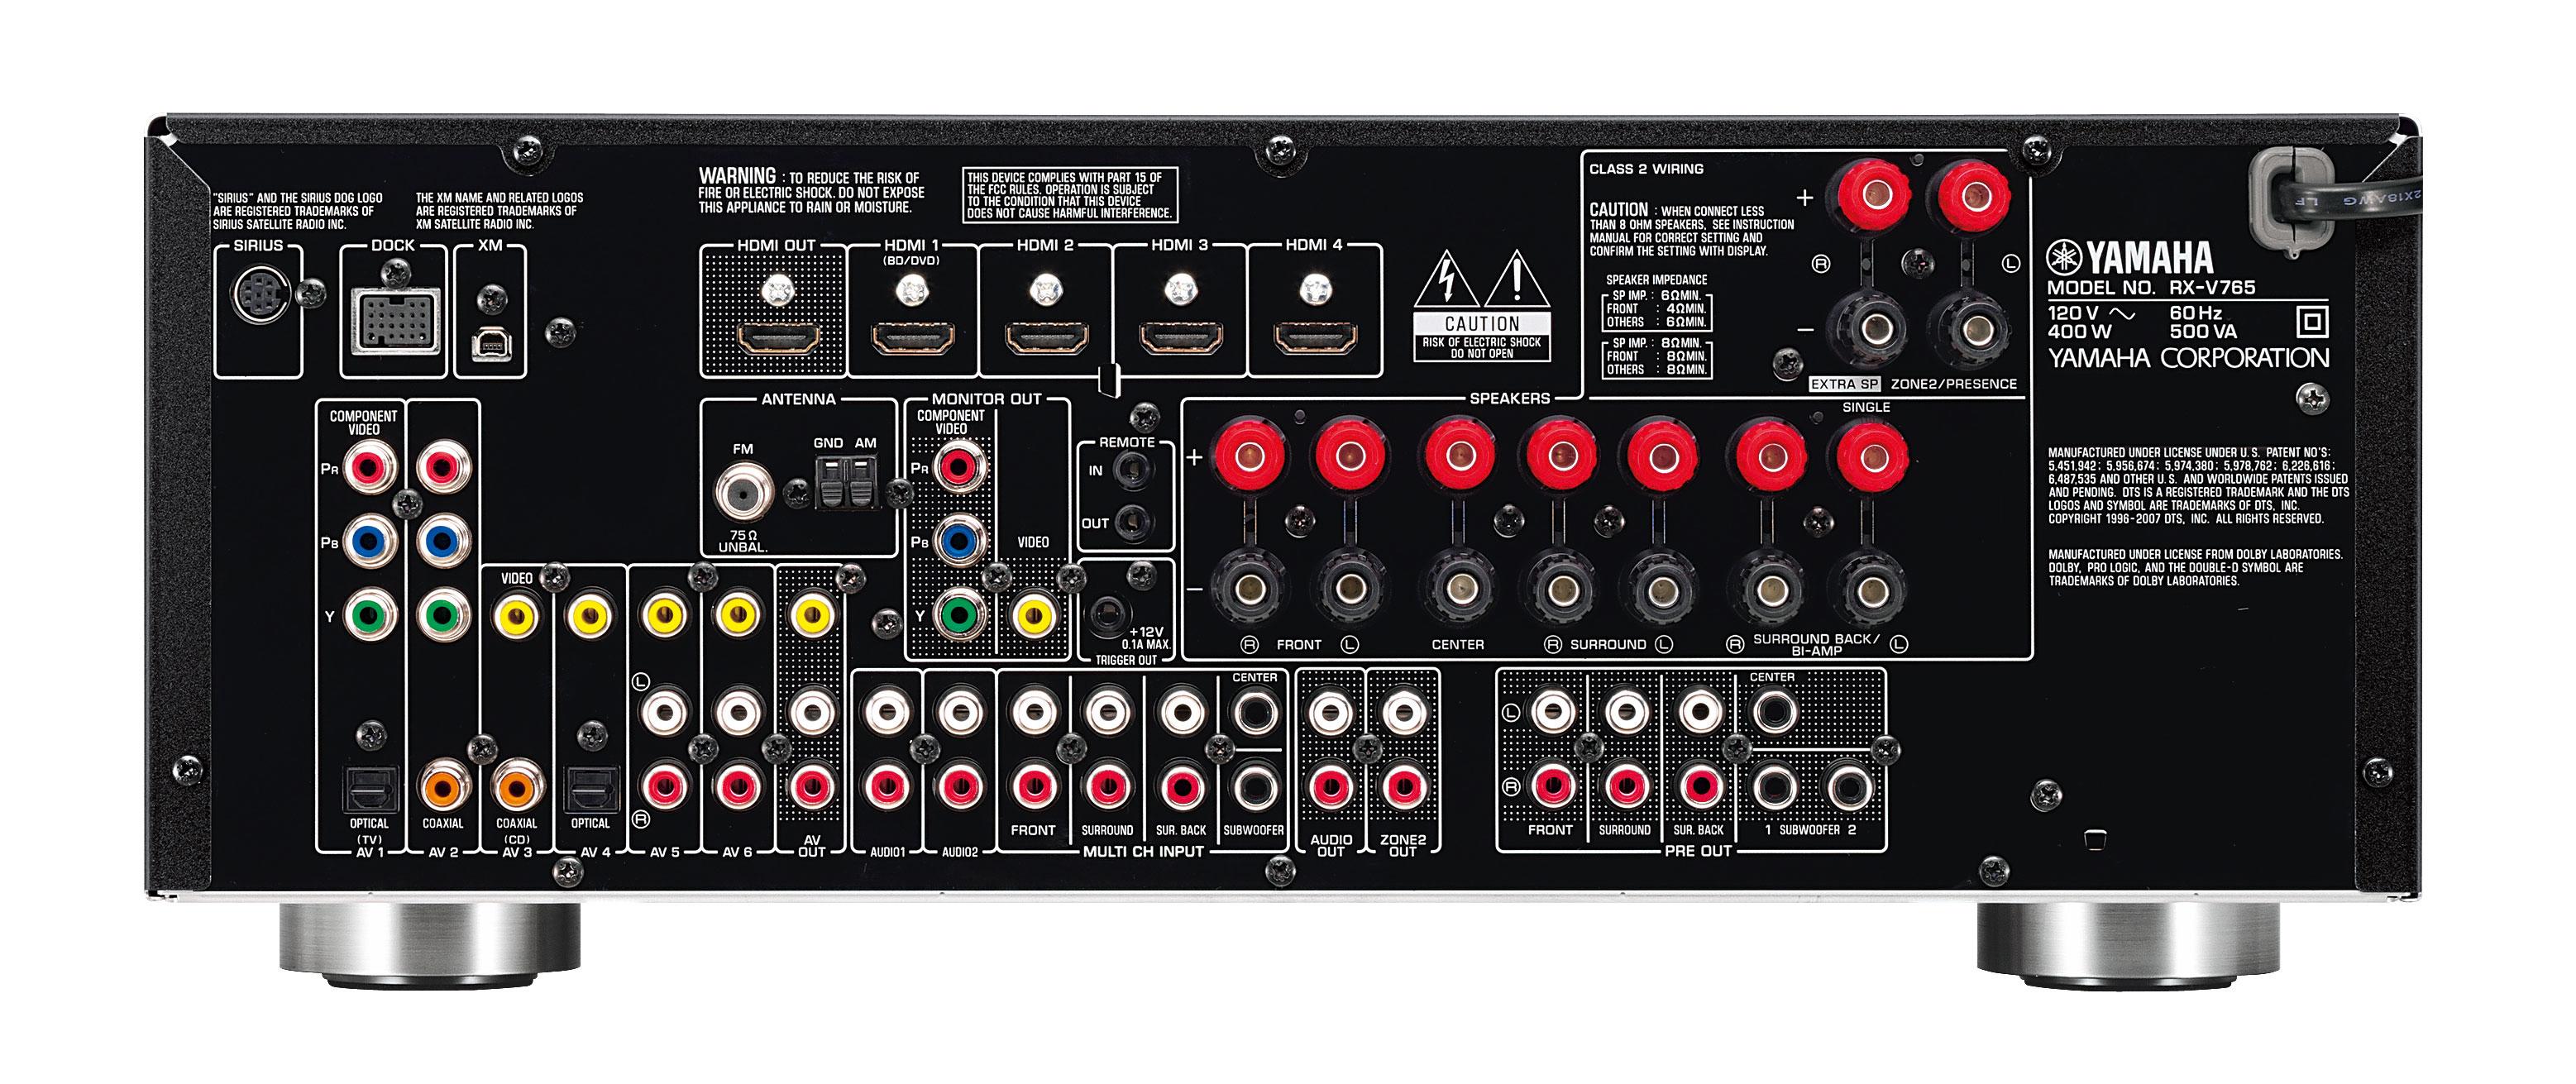 Yamaha receiver internal error / no model info full solution youtube.